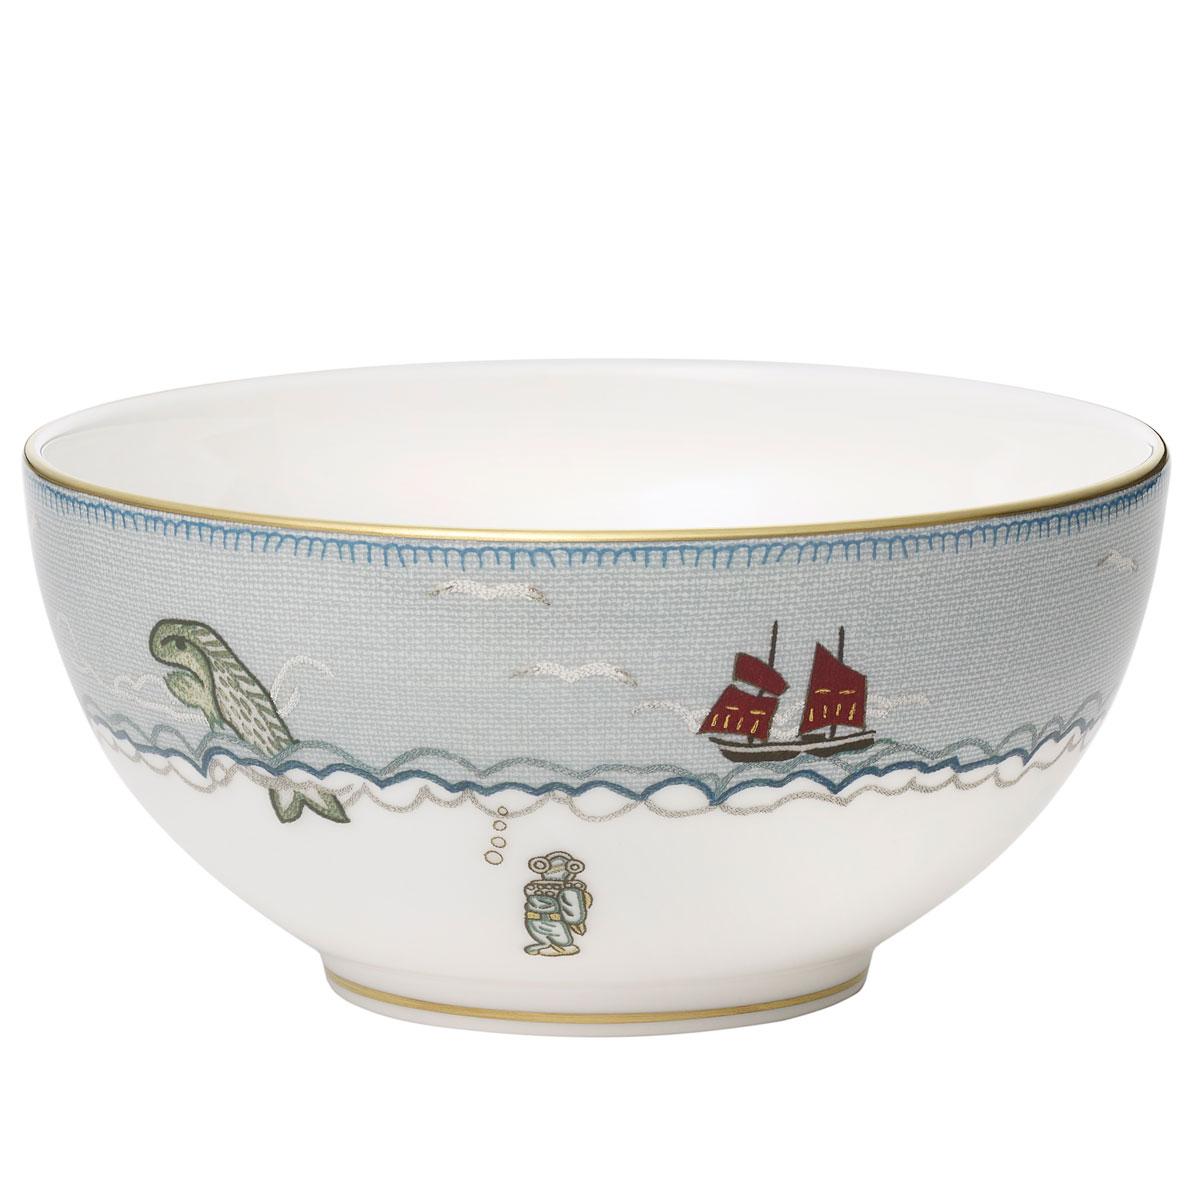 Wedgwood Sailors Farewell Soup Cereal Bowl, Single